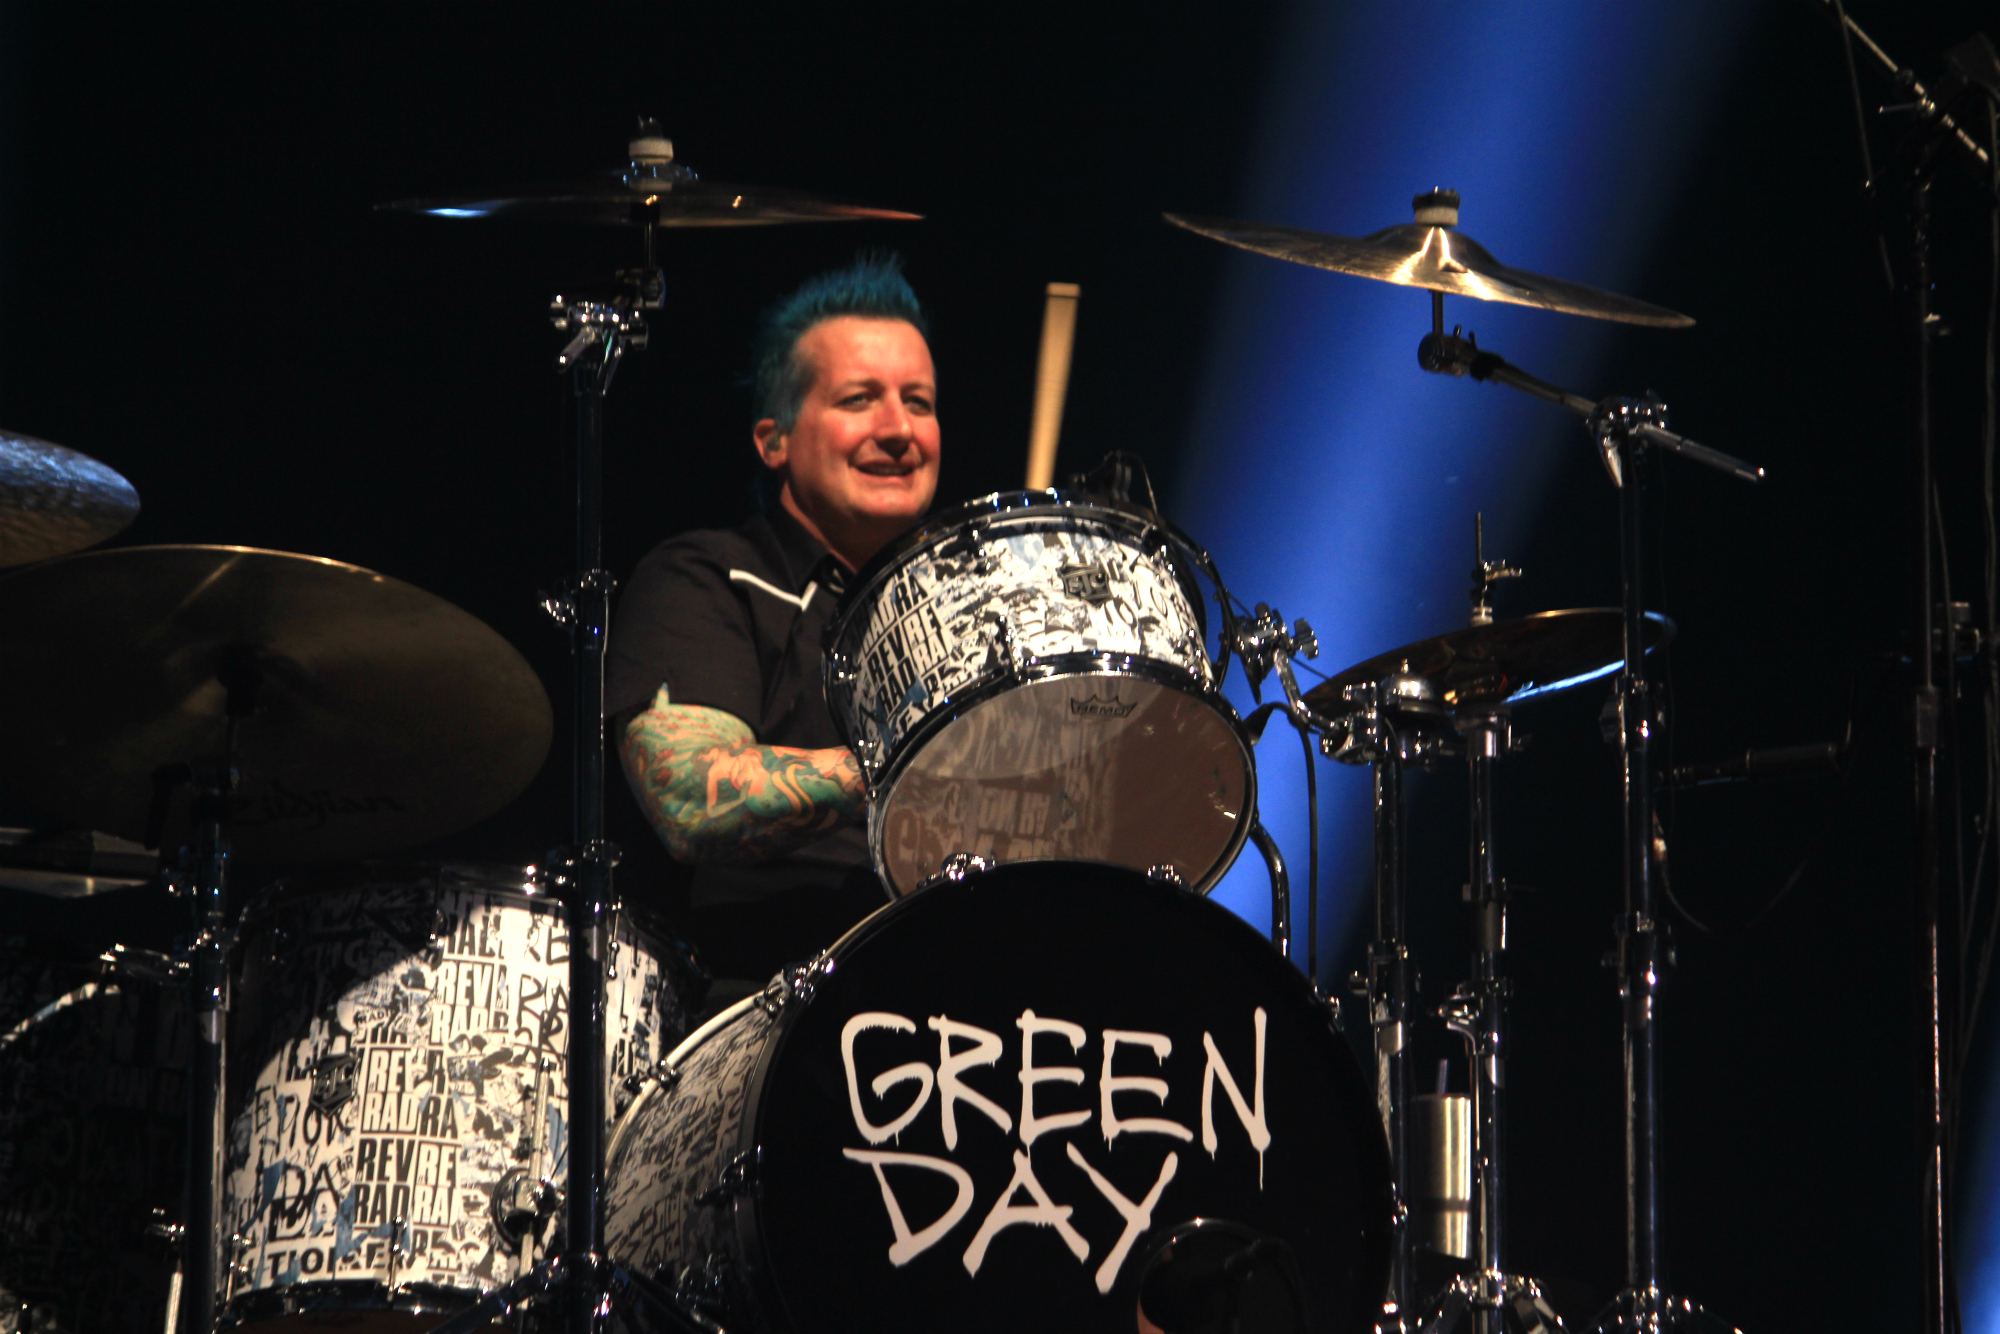 kaplan wrigley green day 16 kaplan wrigley green day 16